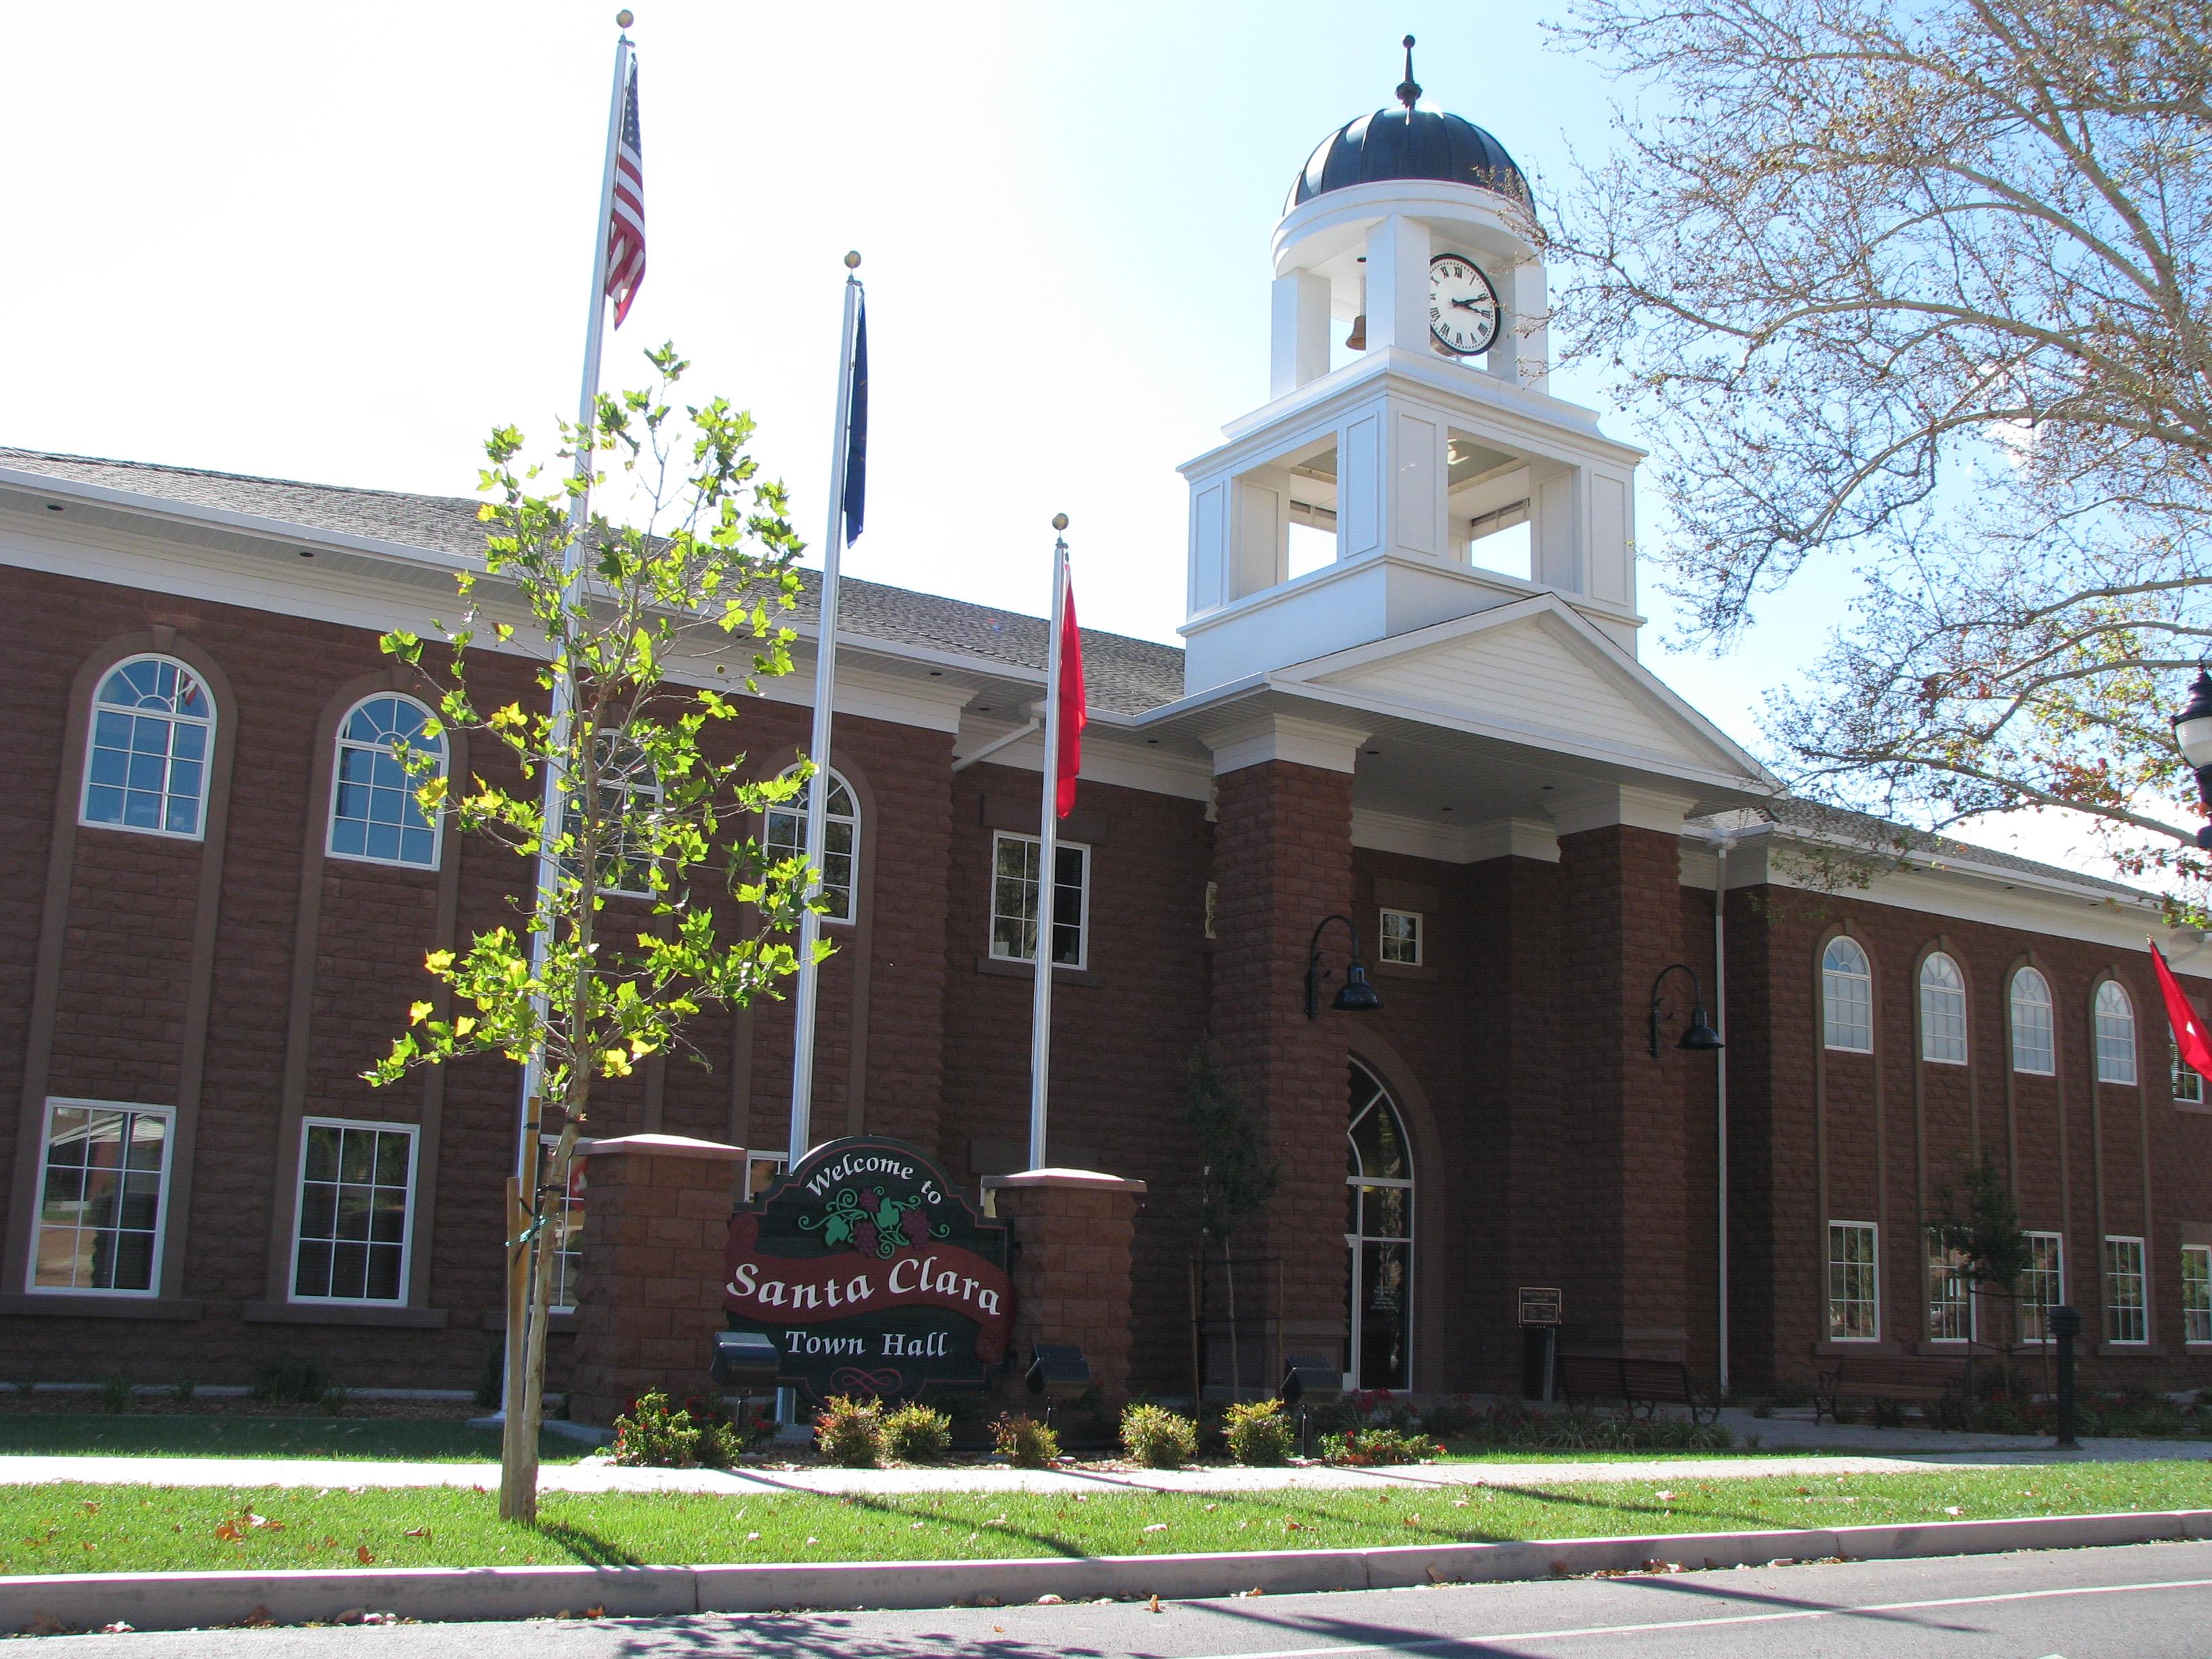 File:Santa Clara Utah Townsanta clara town